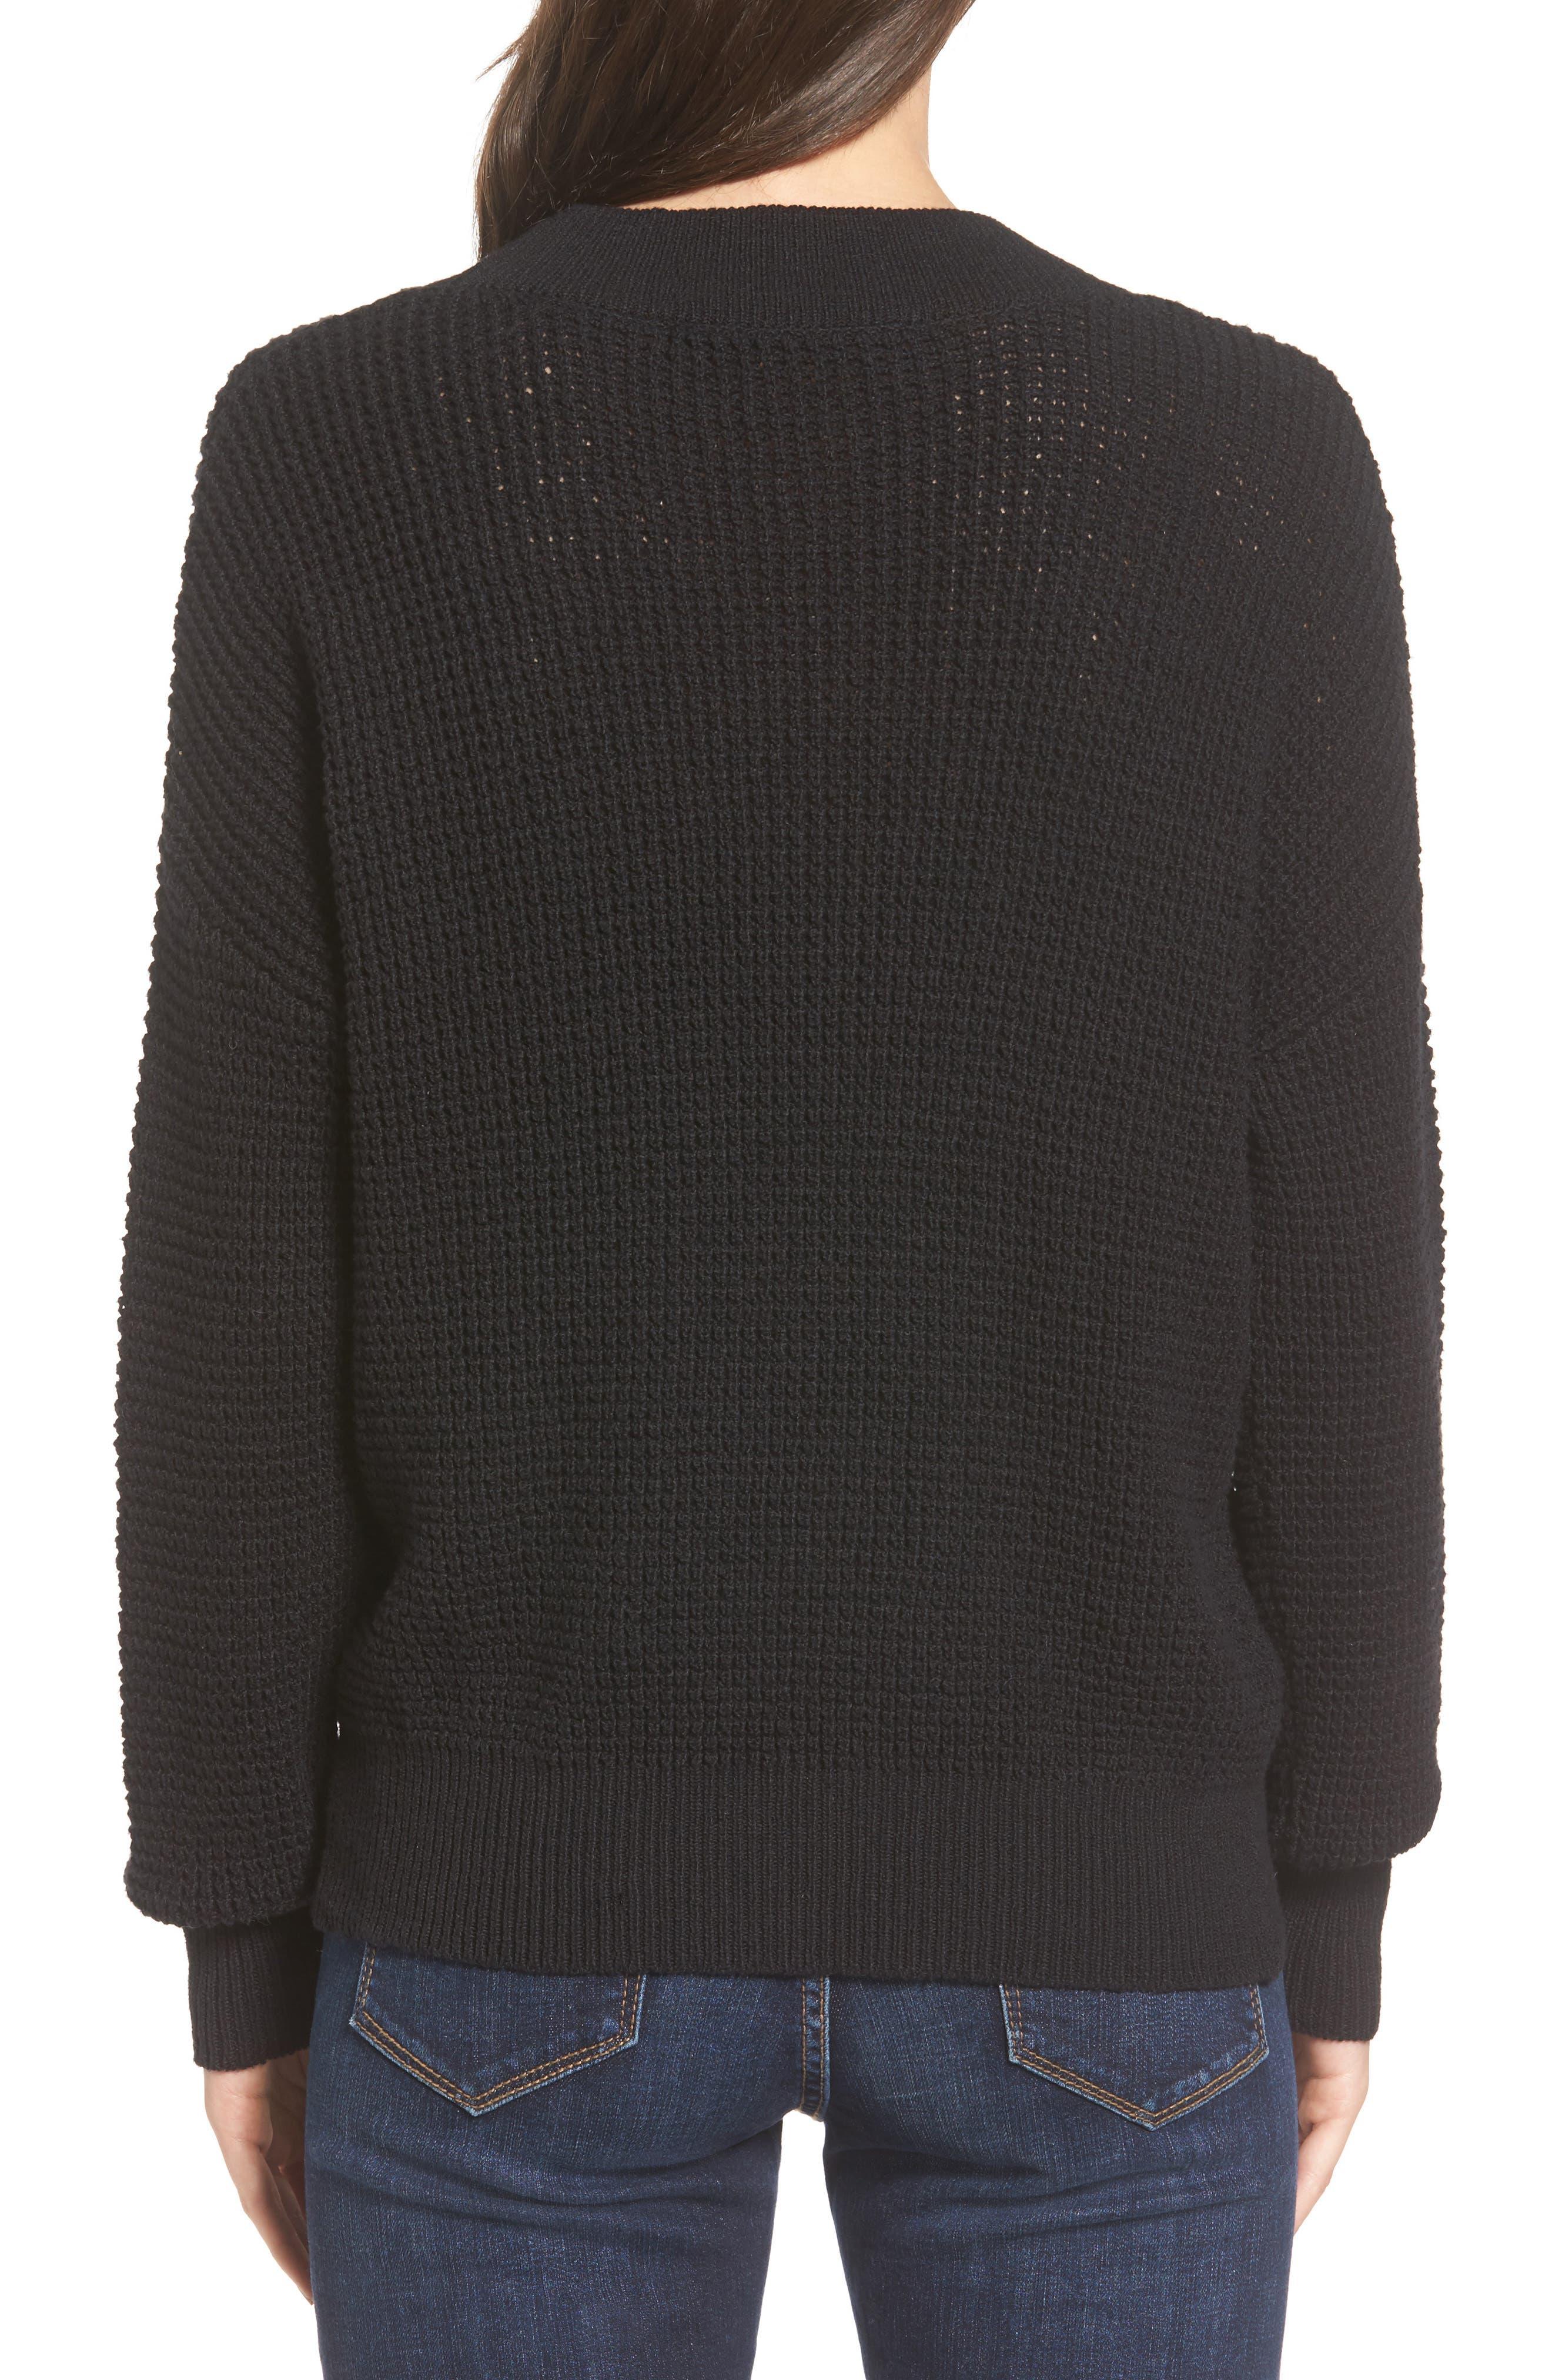 Stephanie Surplice Sweater,                             Alternate thumbnail 2, color,                             001